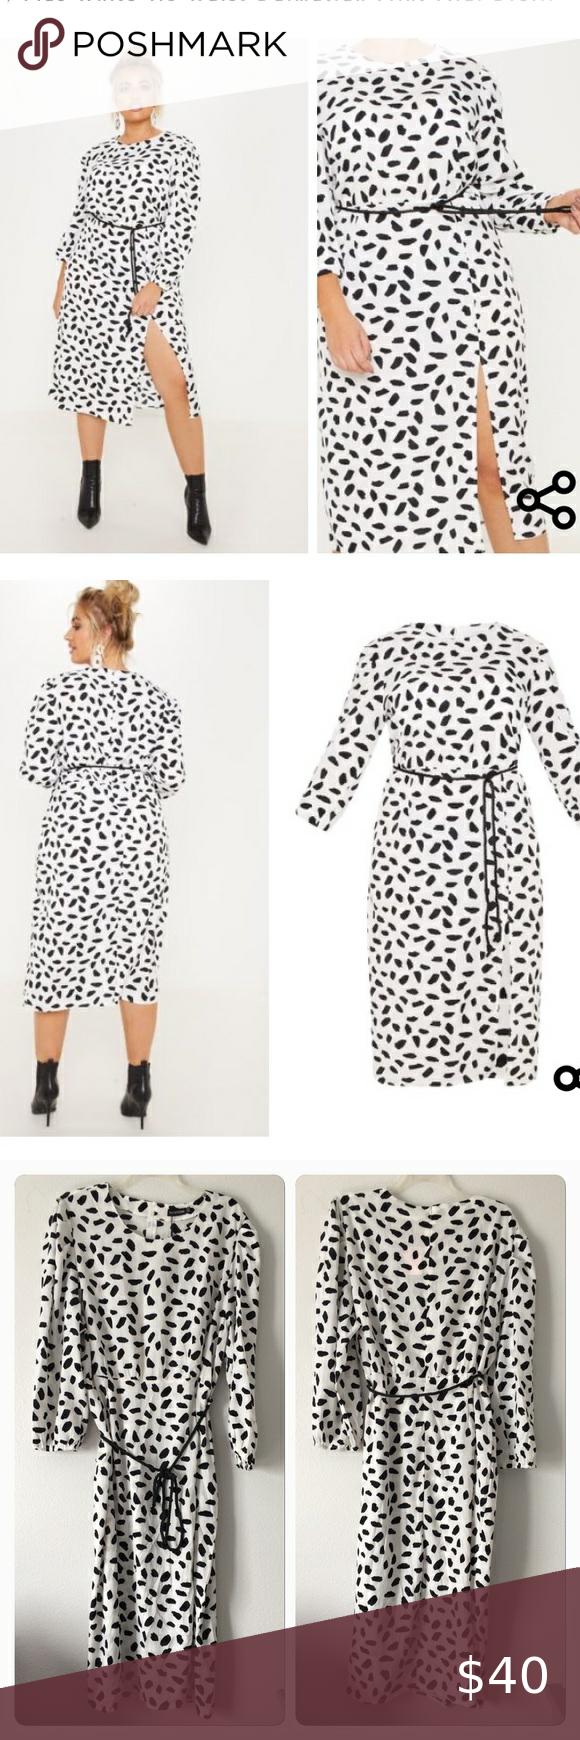 NWT Pretty Little Thing Dress Size 2X Pretty Little Thing